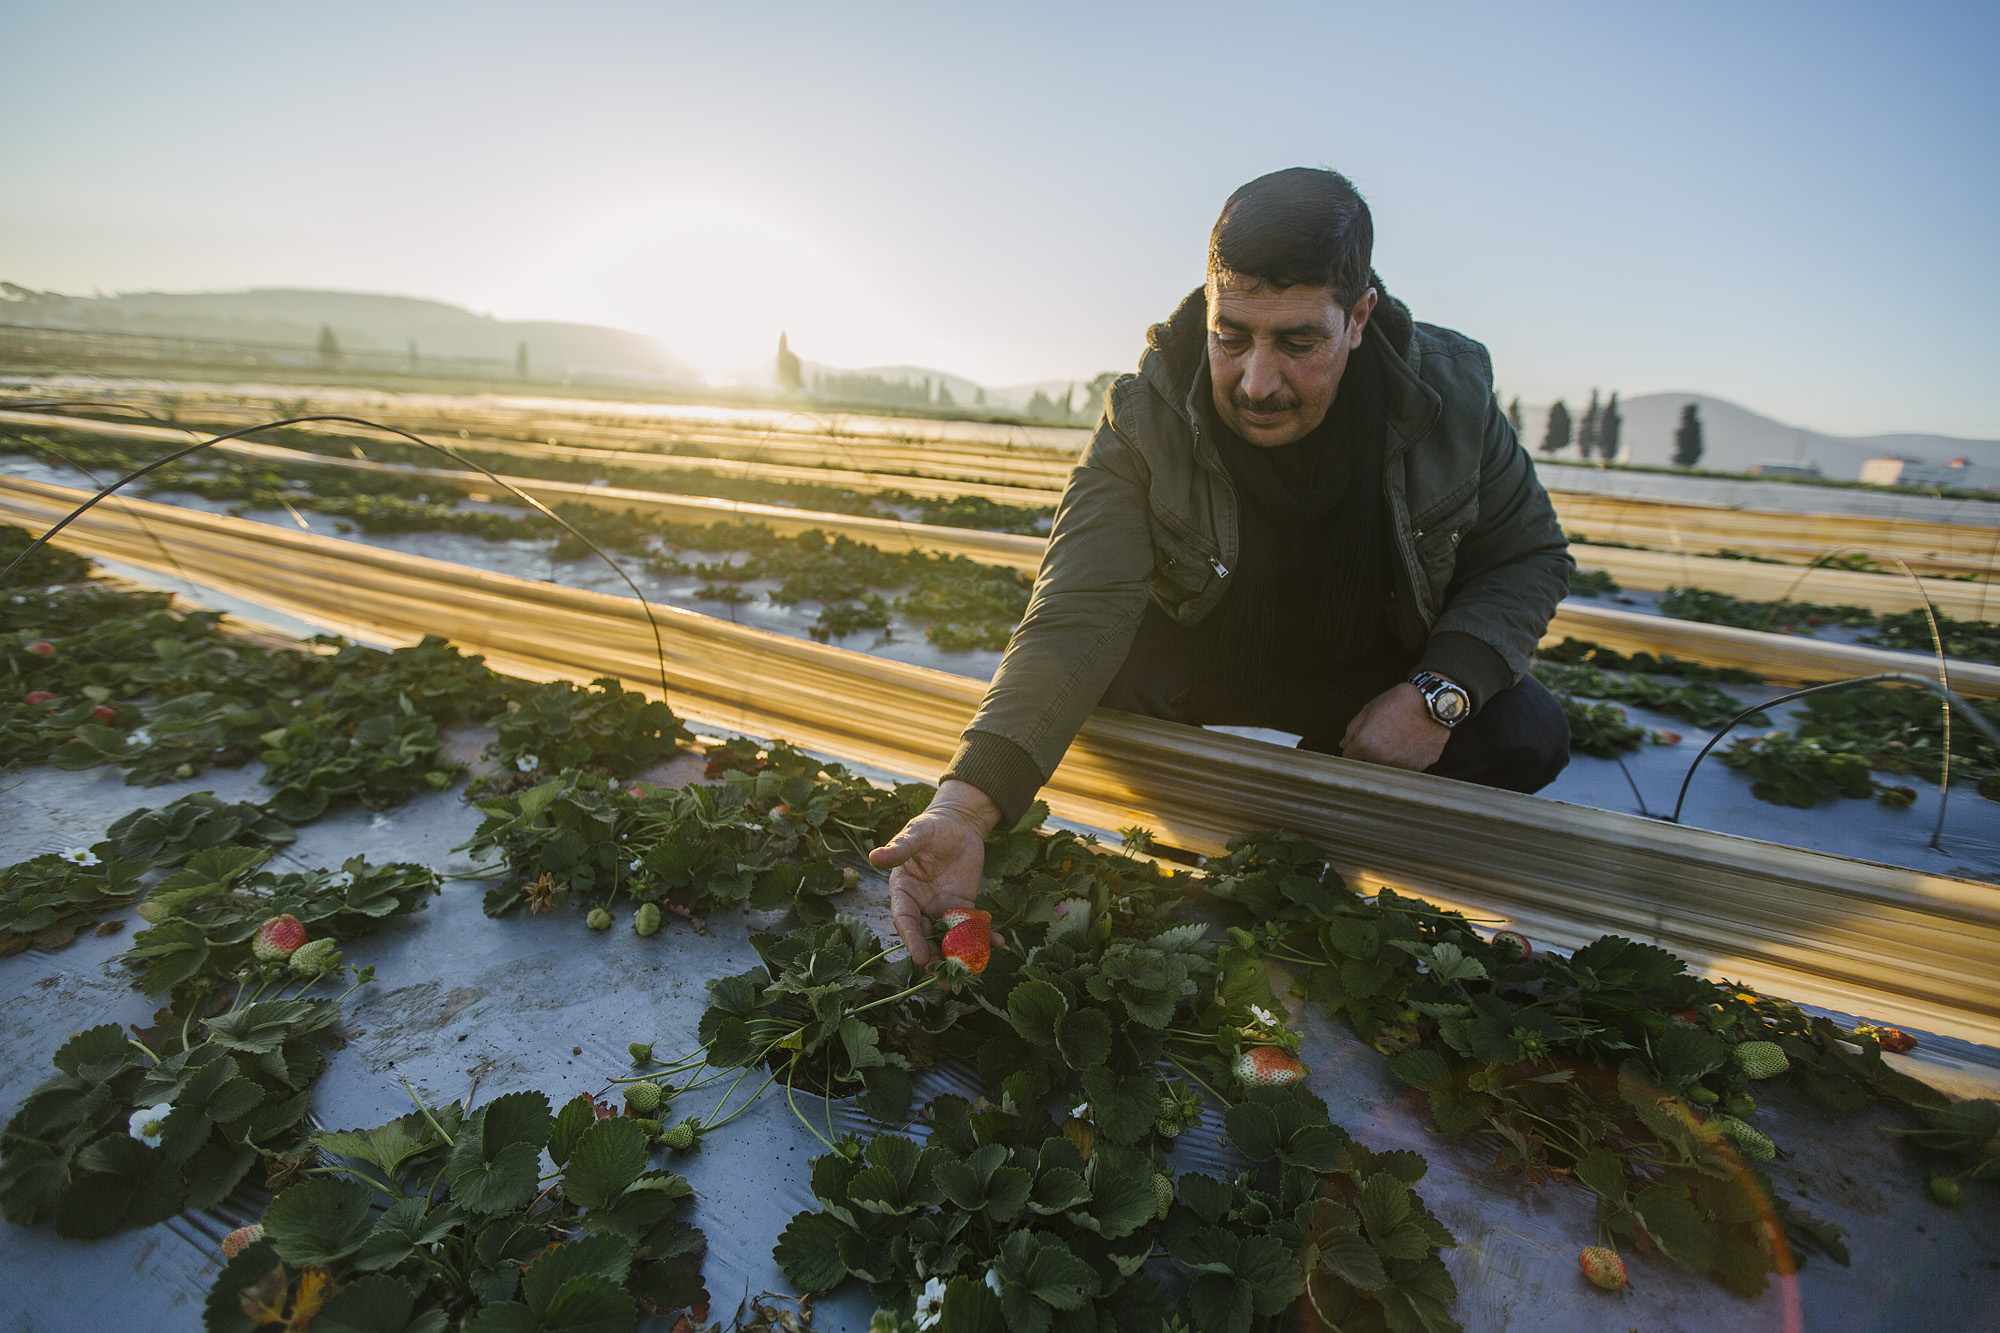 USAID-Israel-Day5-Strawberries-_07A7763.jpg